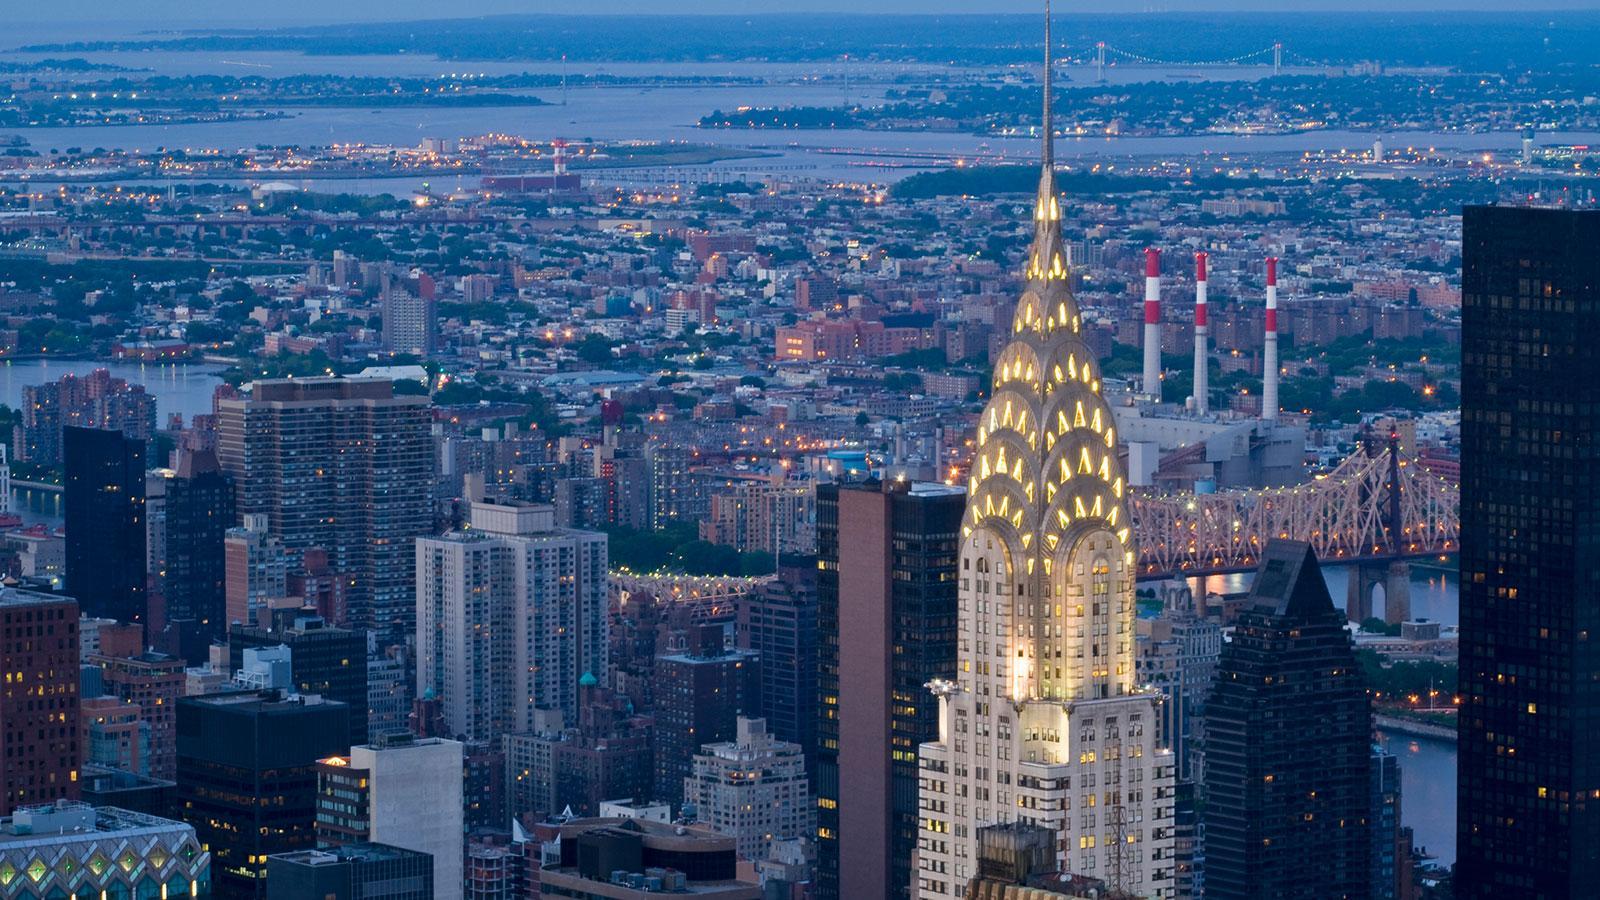 крайслер билдинг в нью йорке фото